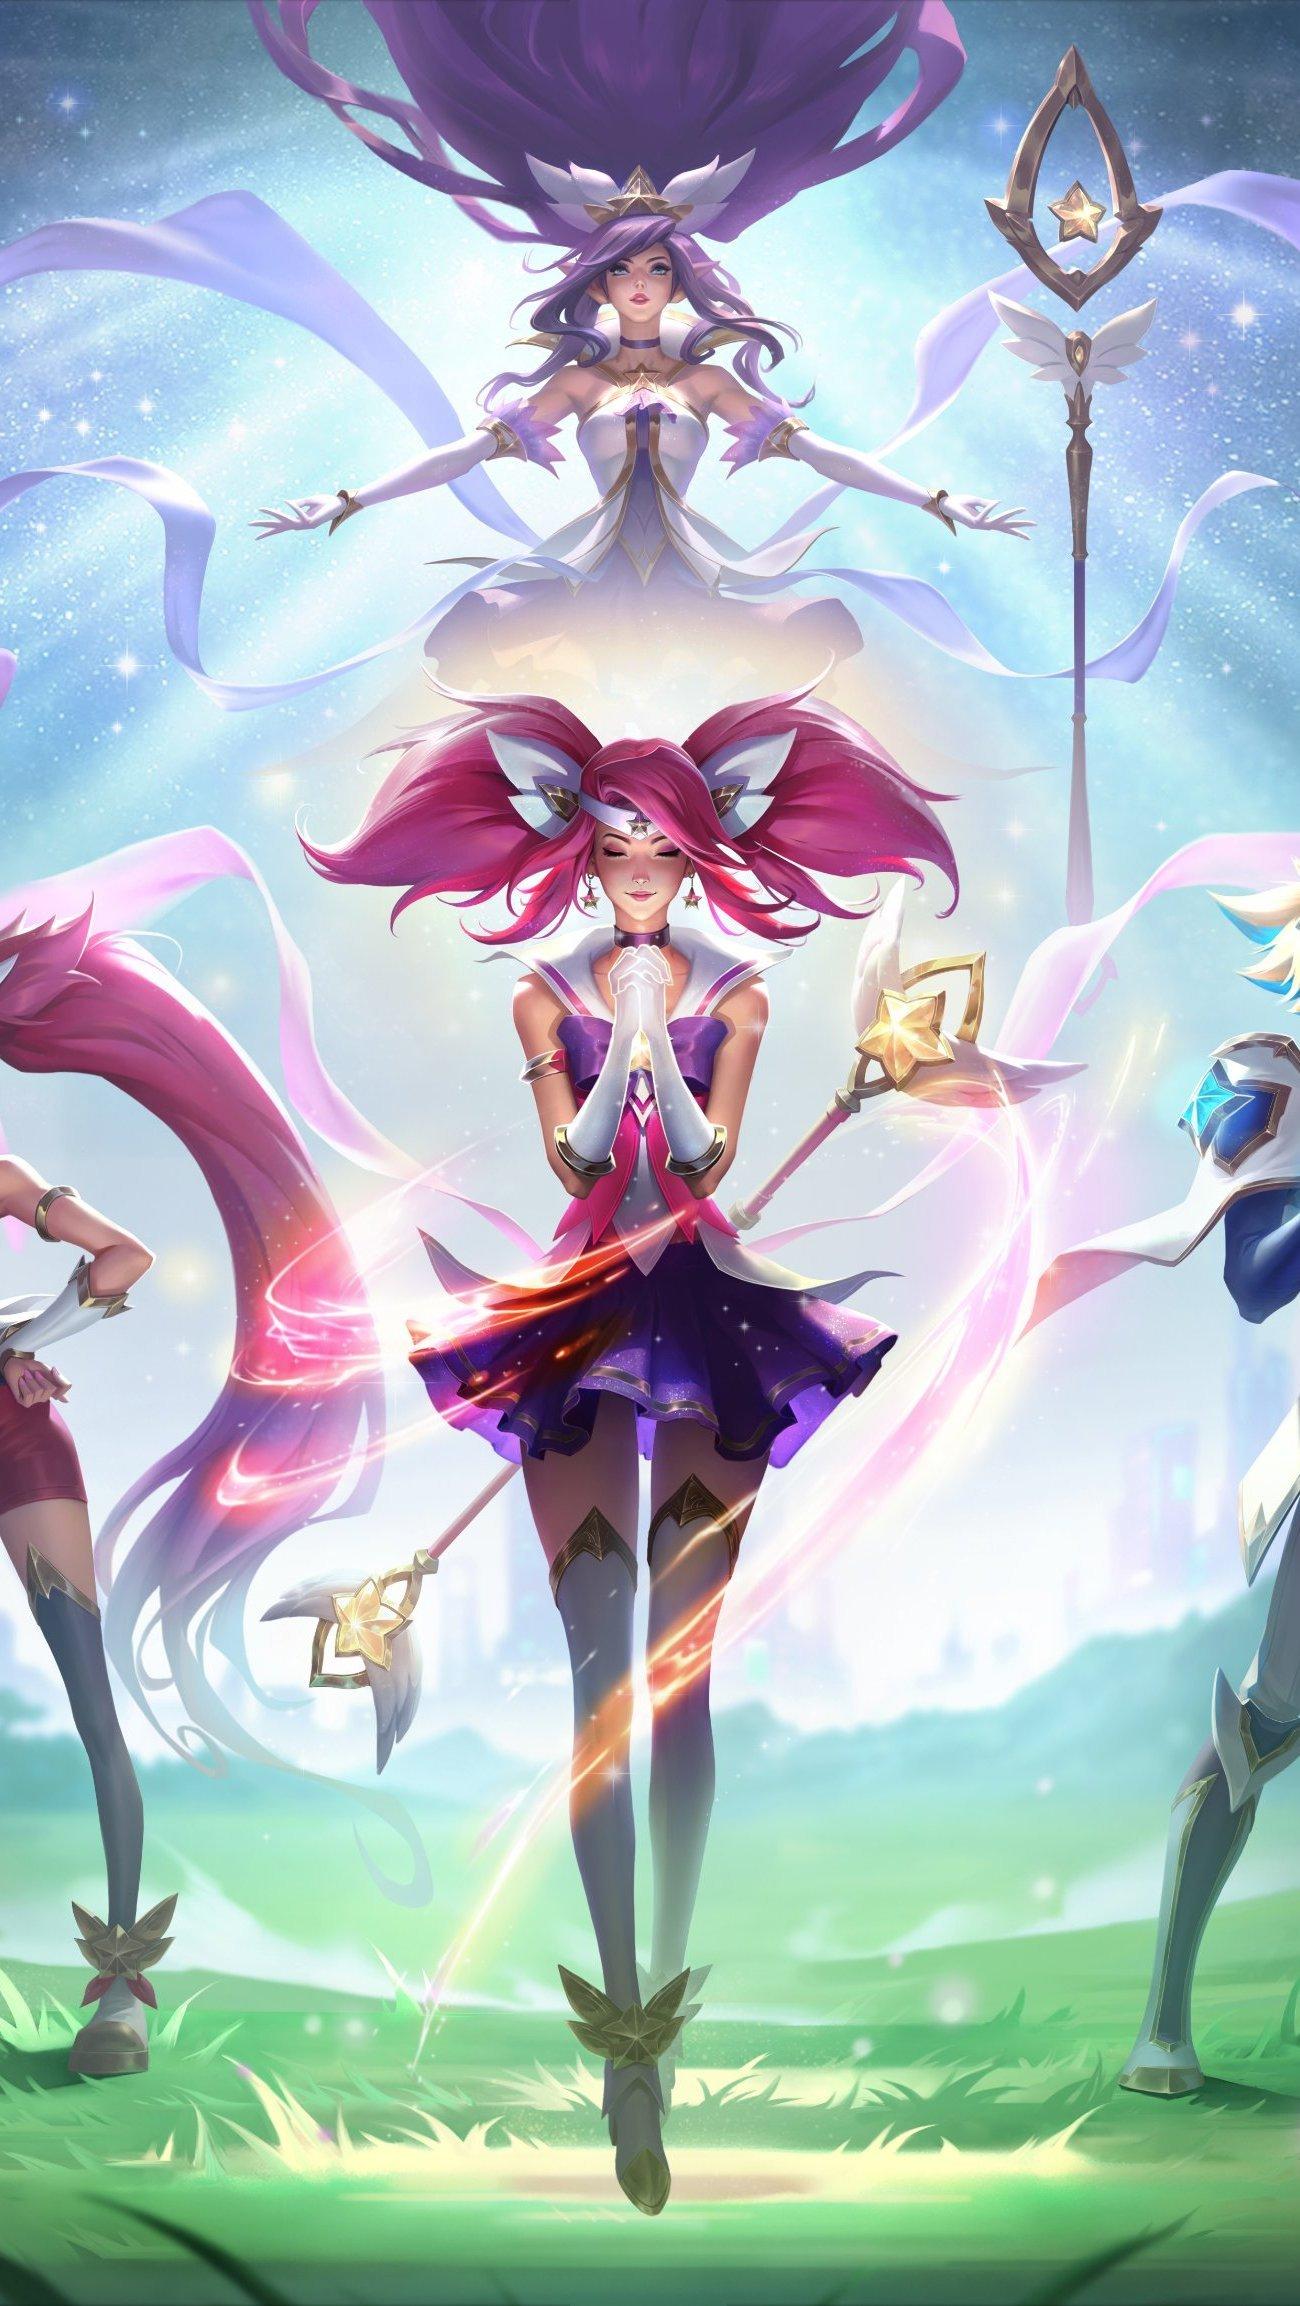 Fondos de pantalla Star Guardian, Ezreal, Lux, Janna Ezreal Wild Rift League of Legends Vertical